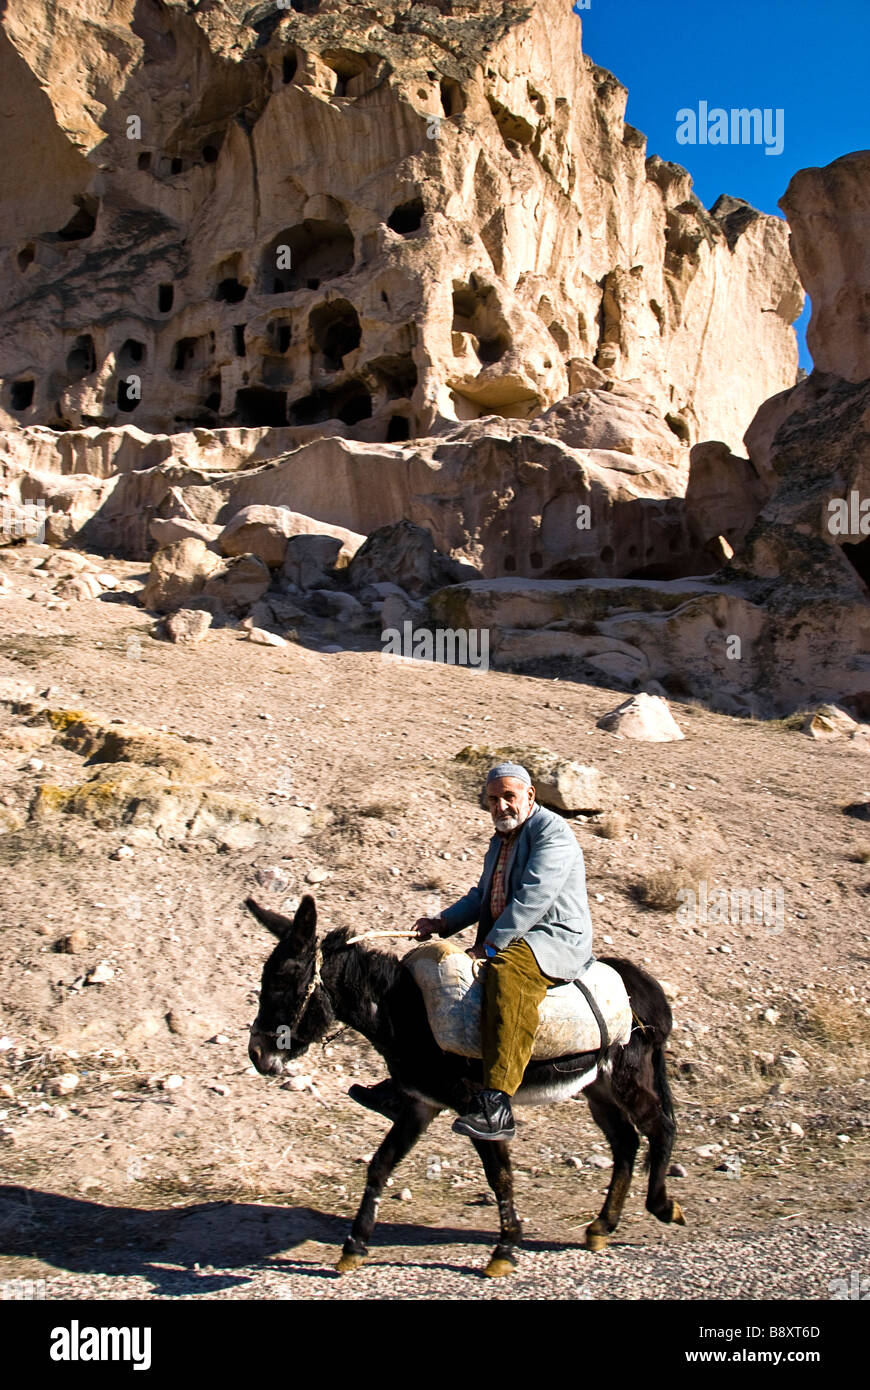 Man on a donkey Capadoccia, Turkey, Asia. - Stock Image